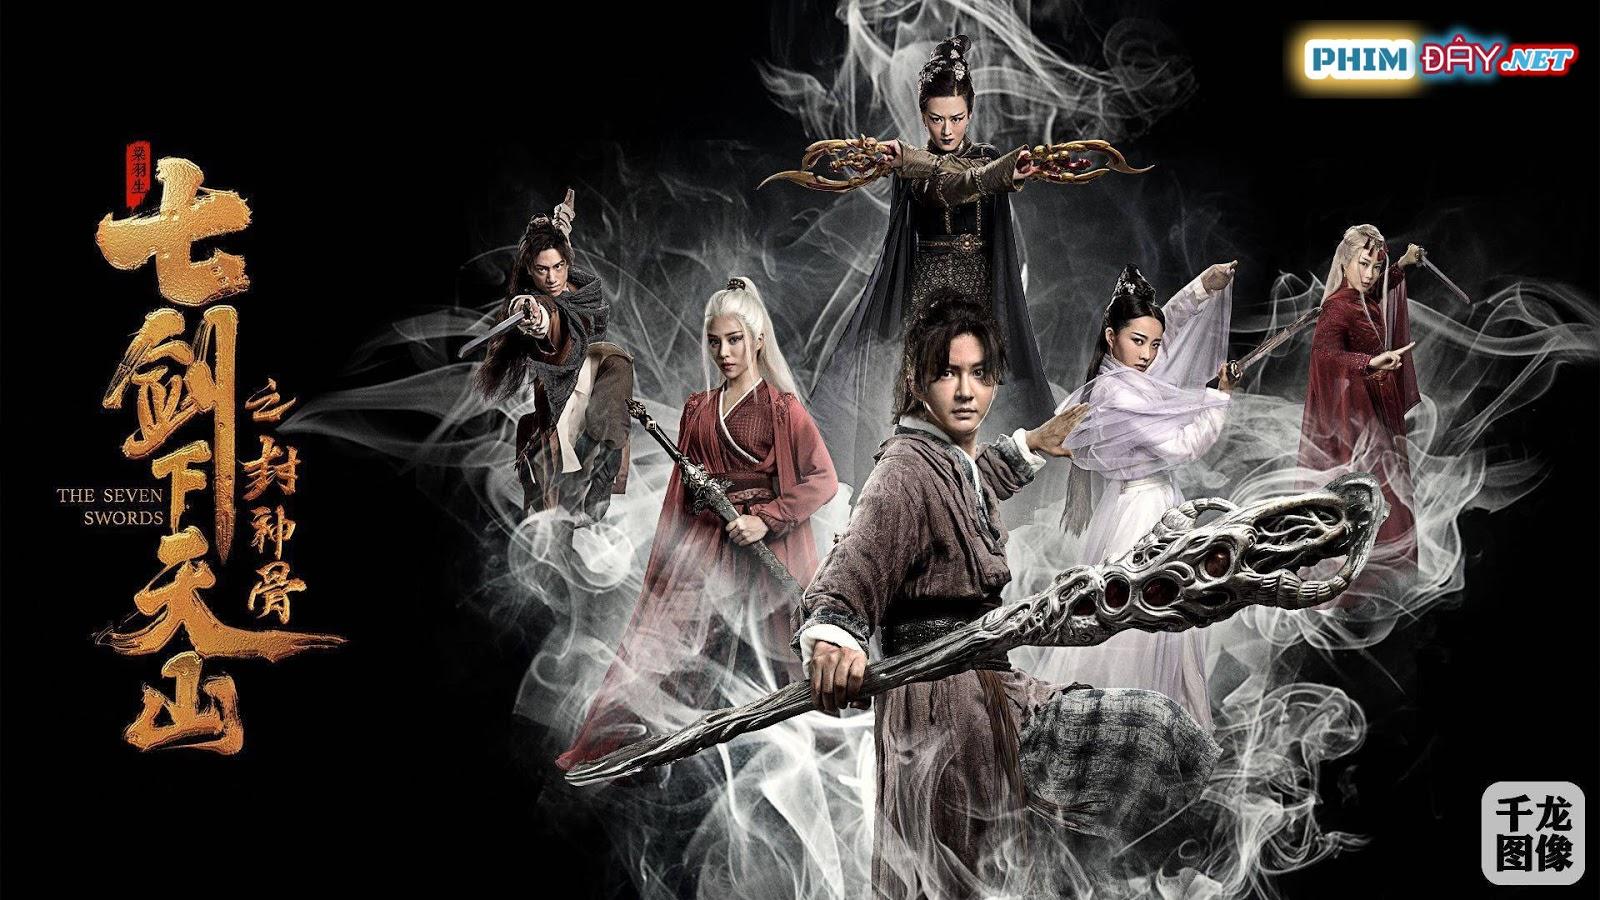 Thất Kiếm Hạ Thiên Sơn 2 - Seven Swords: Bone Of The Godmaker (2019)